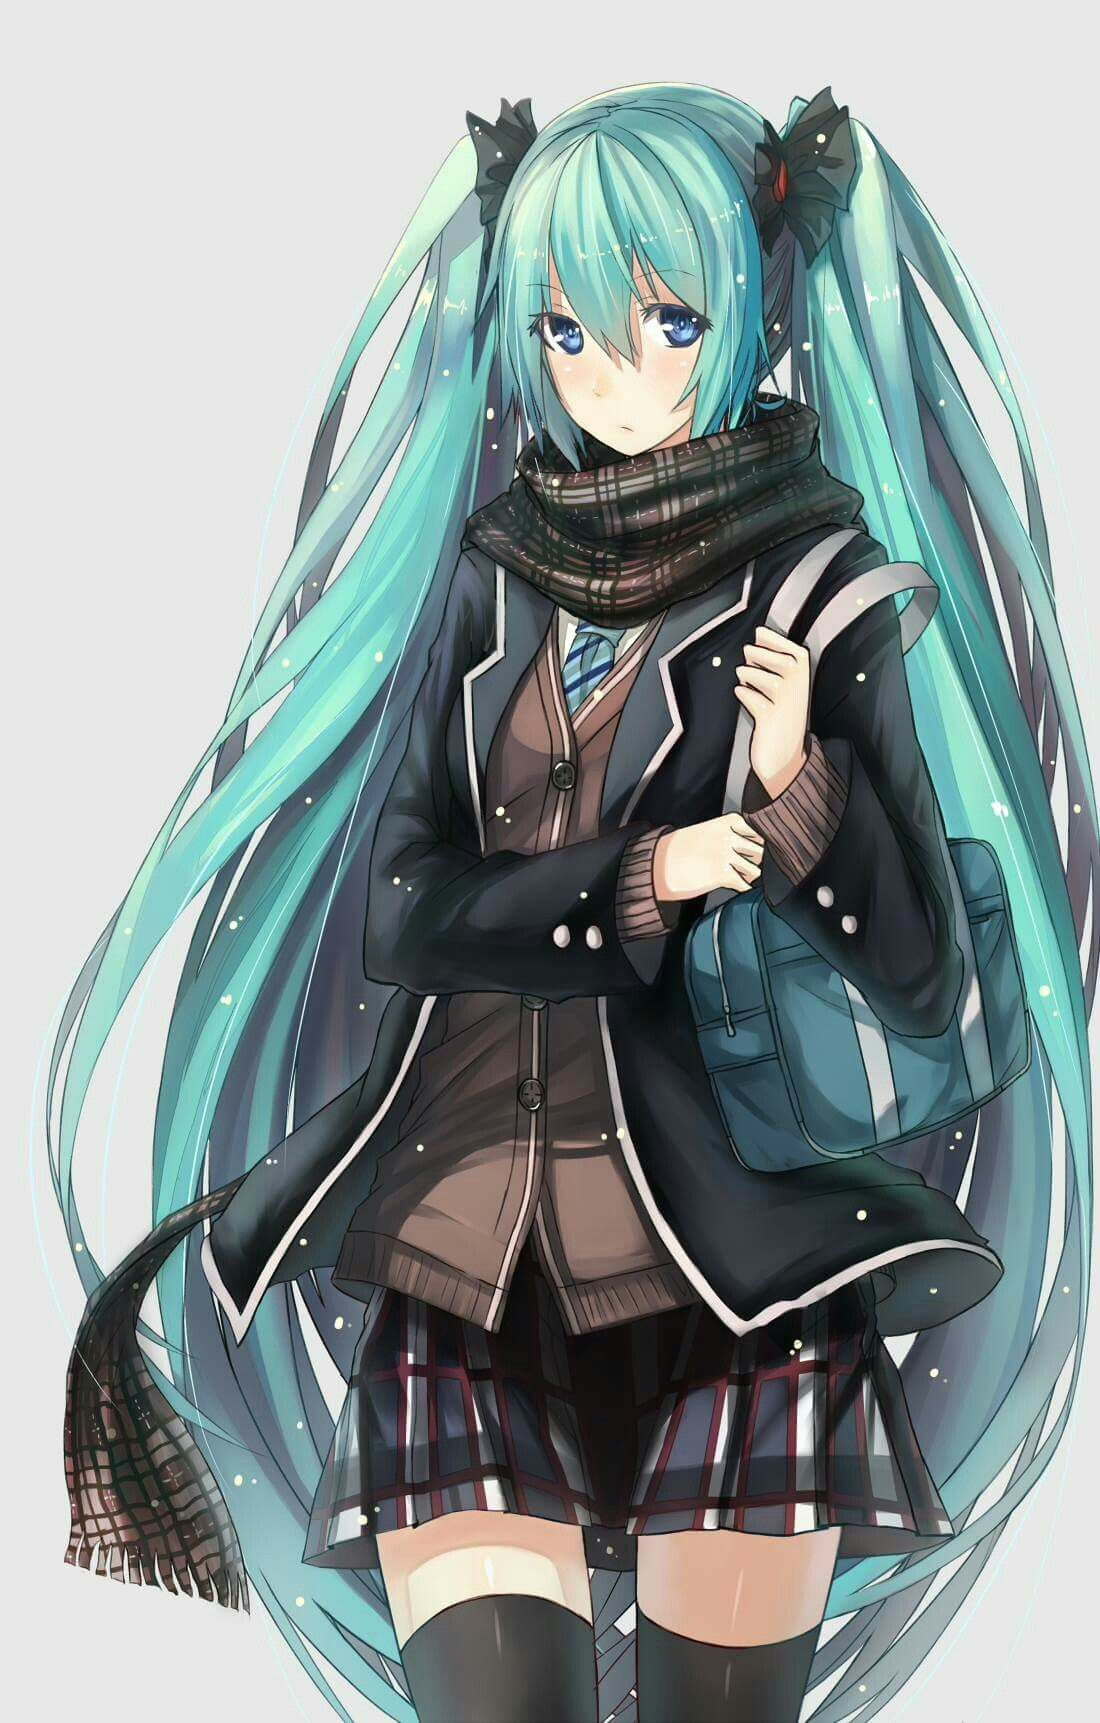 Hatsune Miku ღ school outfit | VOCALOID | Anime, Vocaloid ...  Hatsune Miku �...